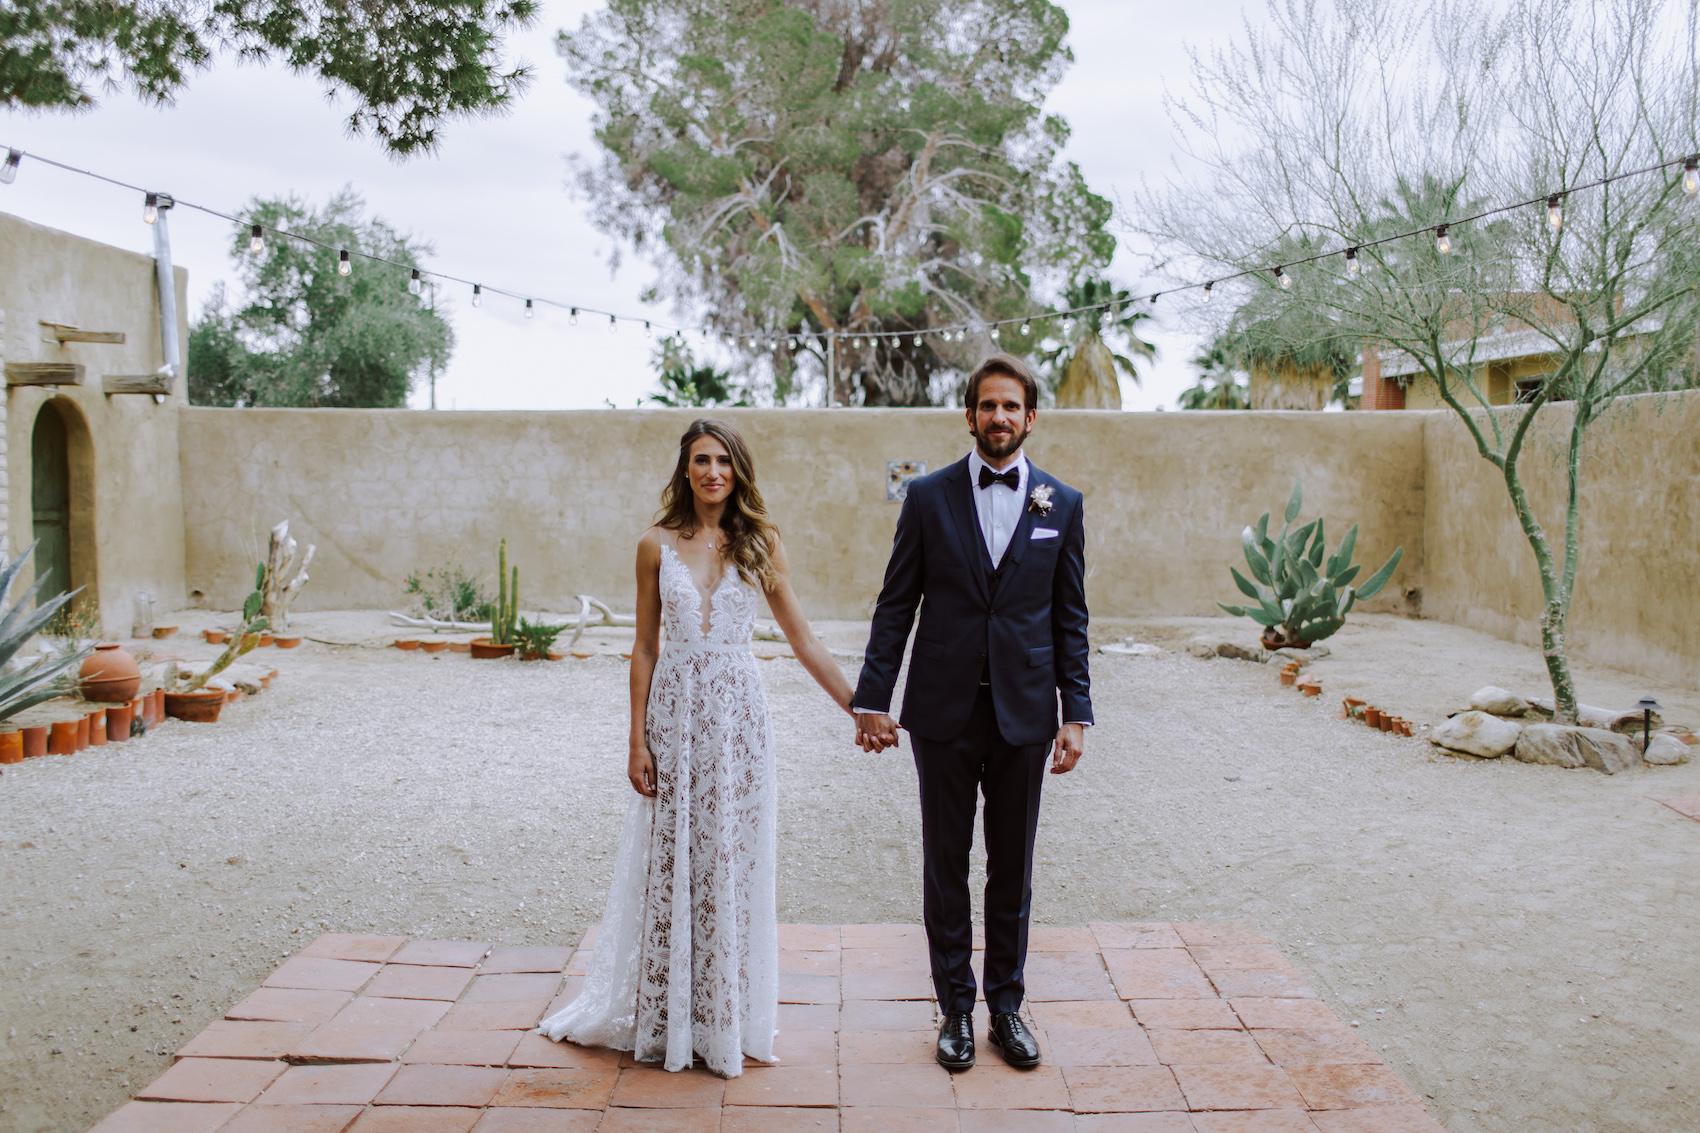 29-Palms-Inn-Joshua-Tree-Jewish-Wedding-H+M-22.jpg